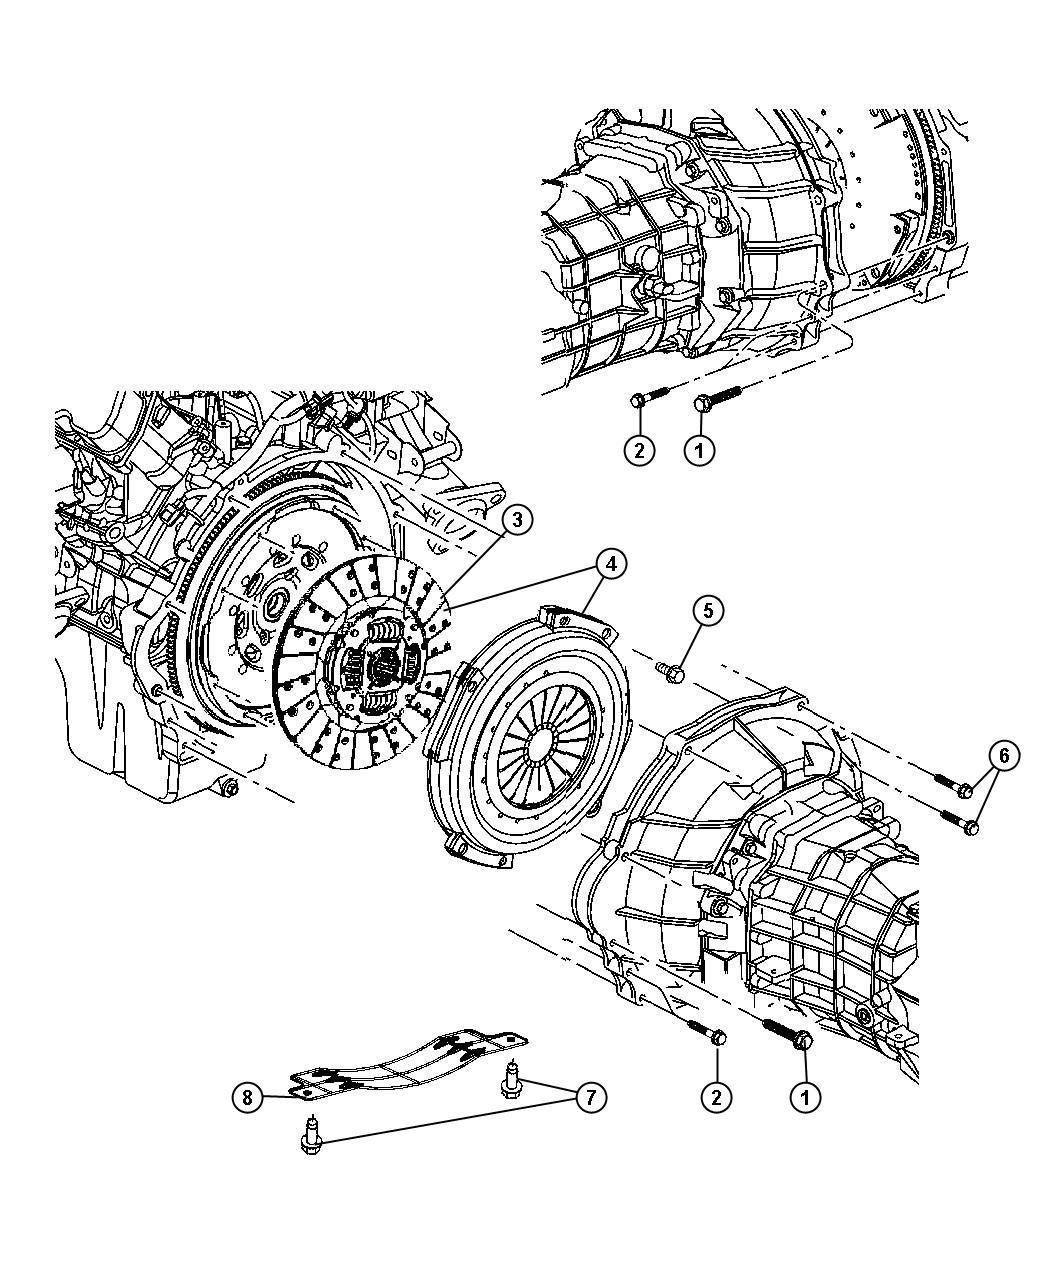 Dodge Ram Clutch Assembly With Ewc Engine